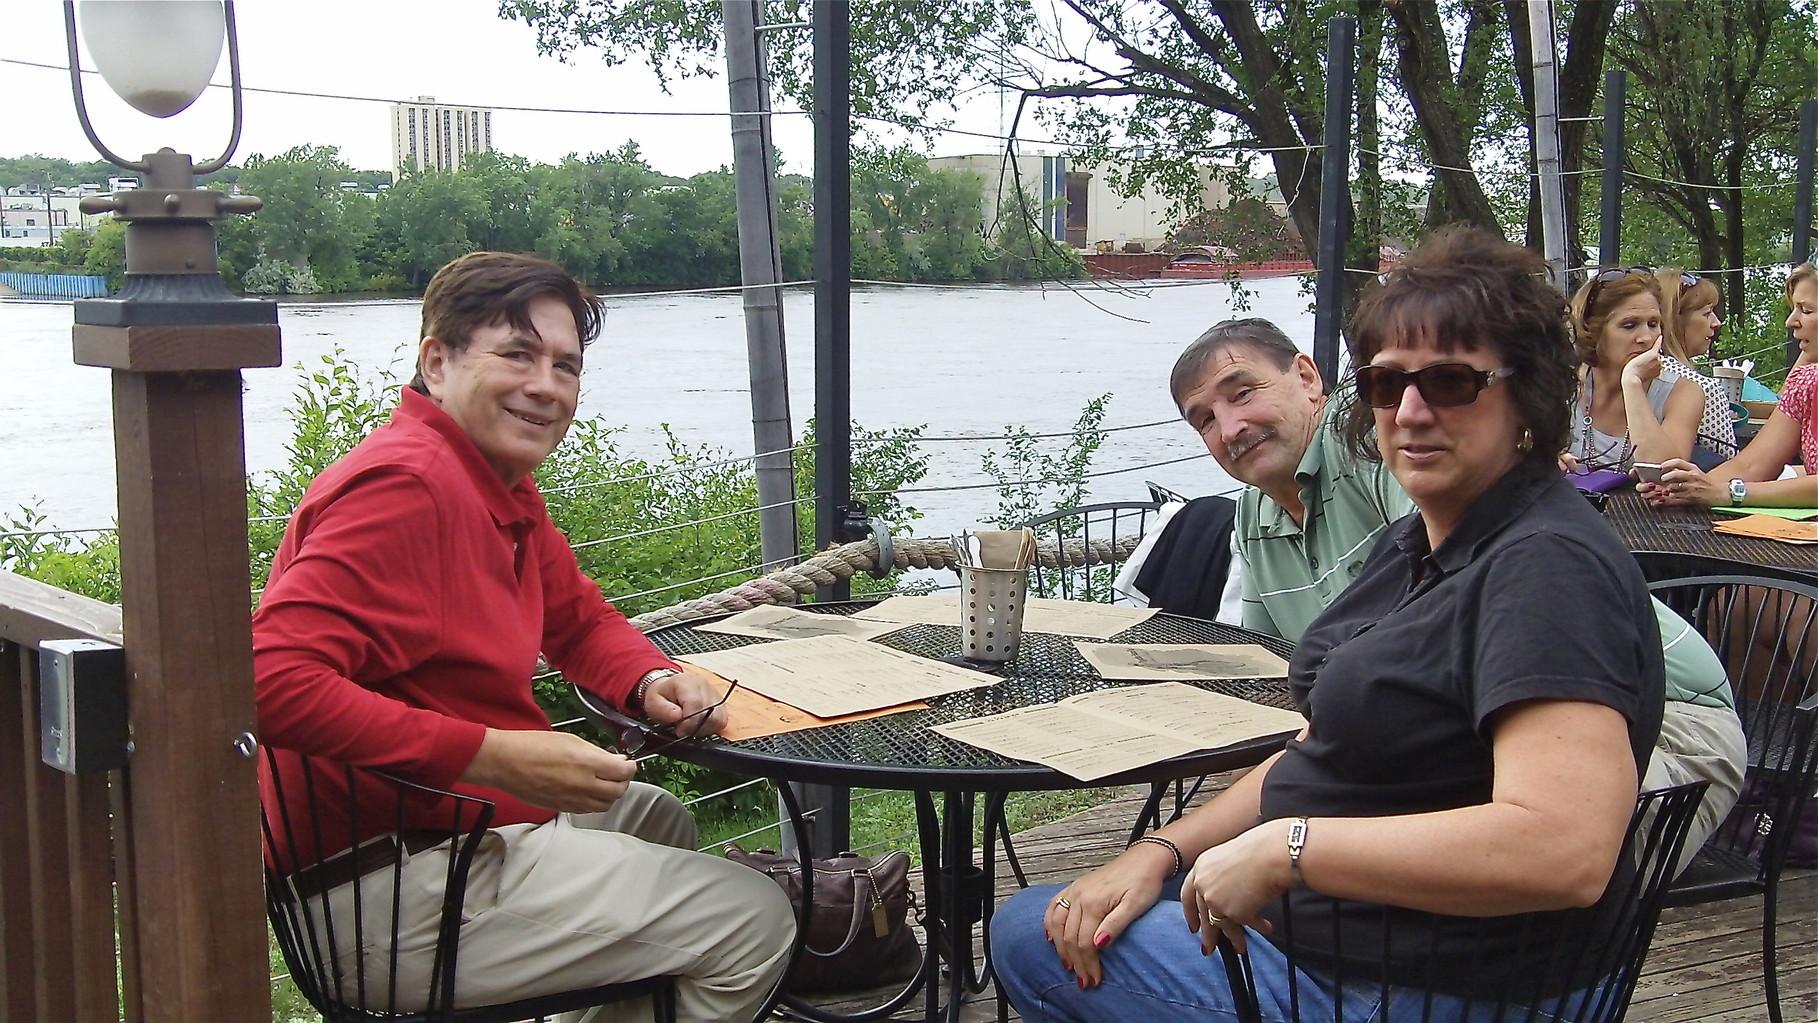 John, Paul & Jill Wagner at Psycho Suzi's Pizza along the Mississippi